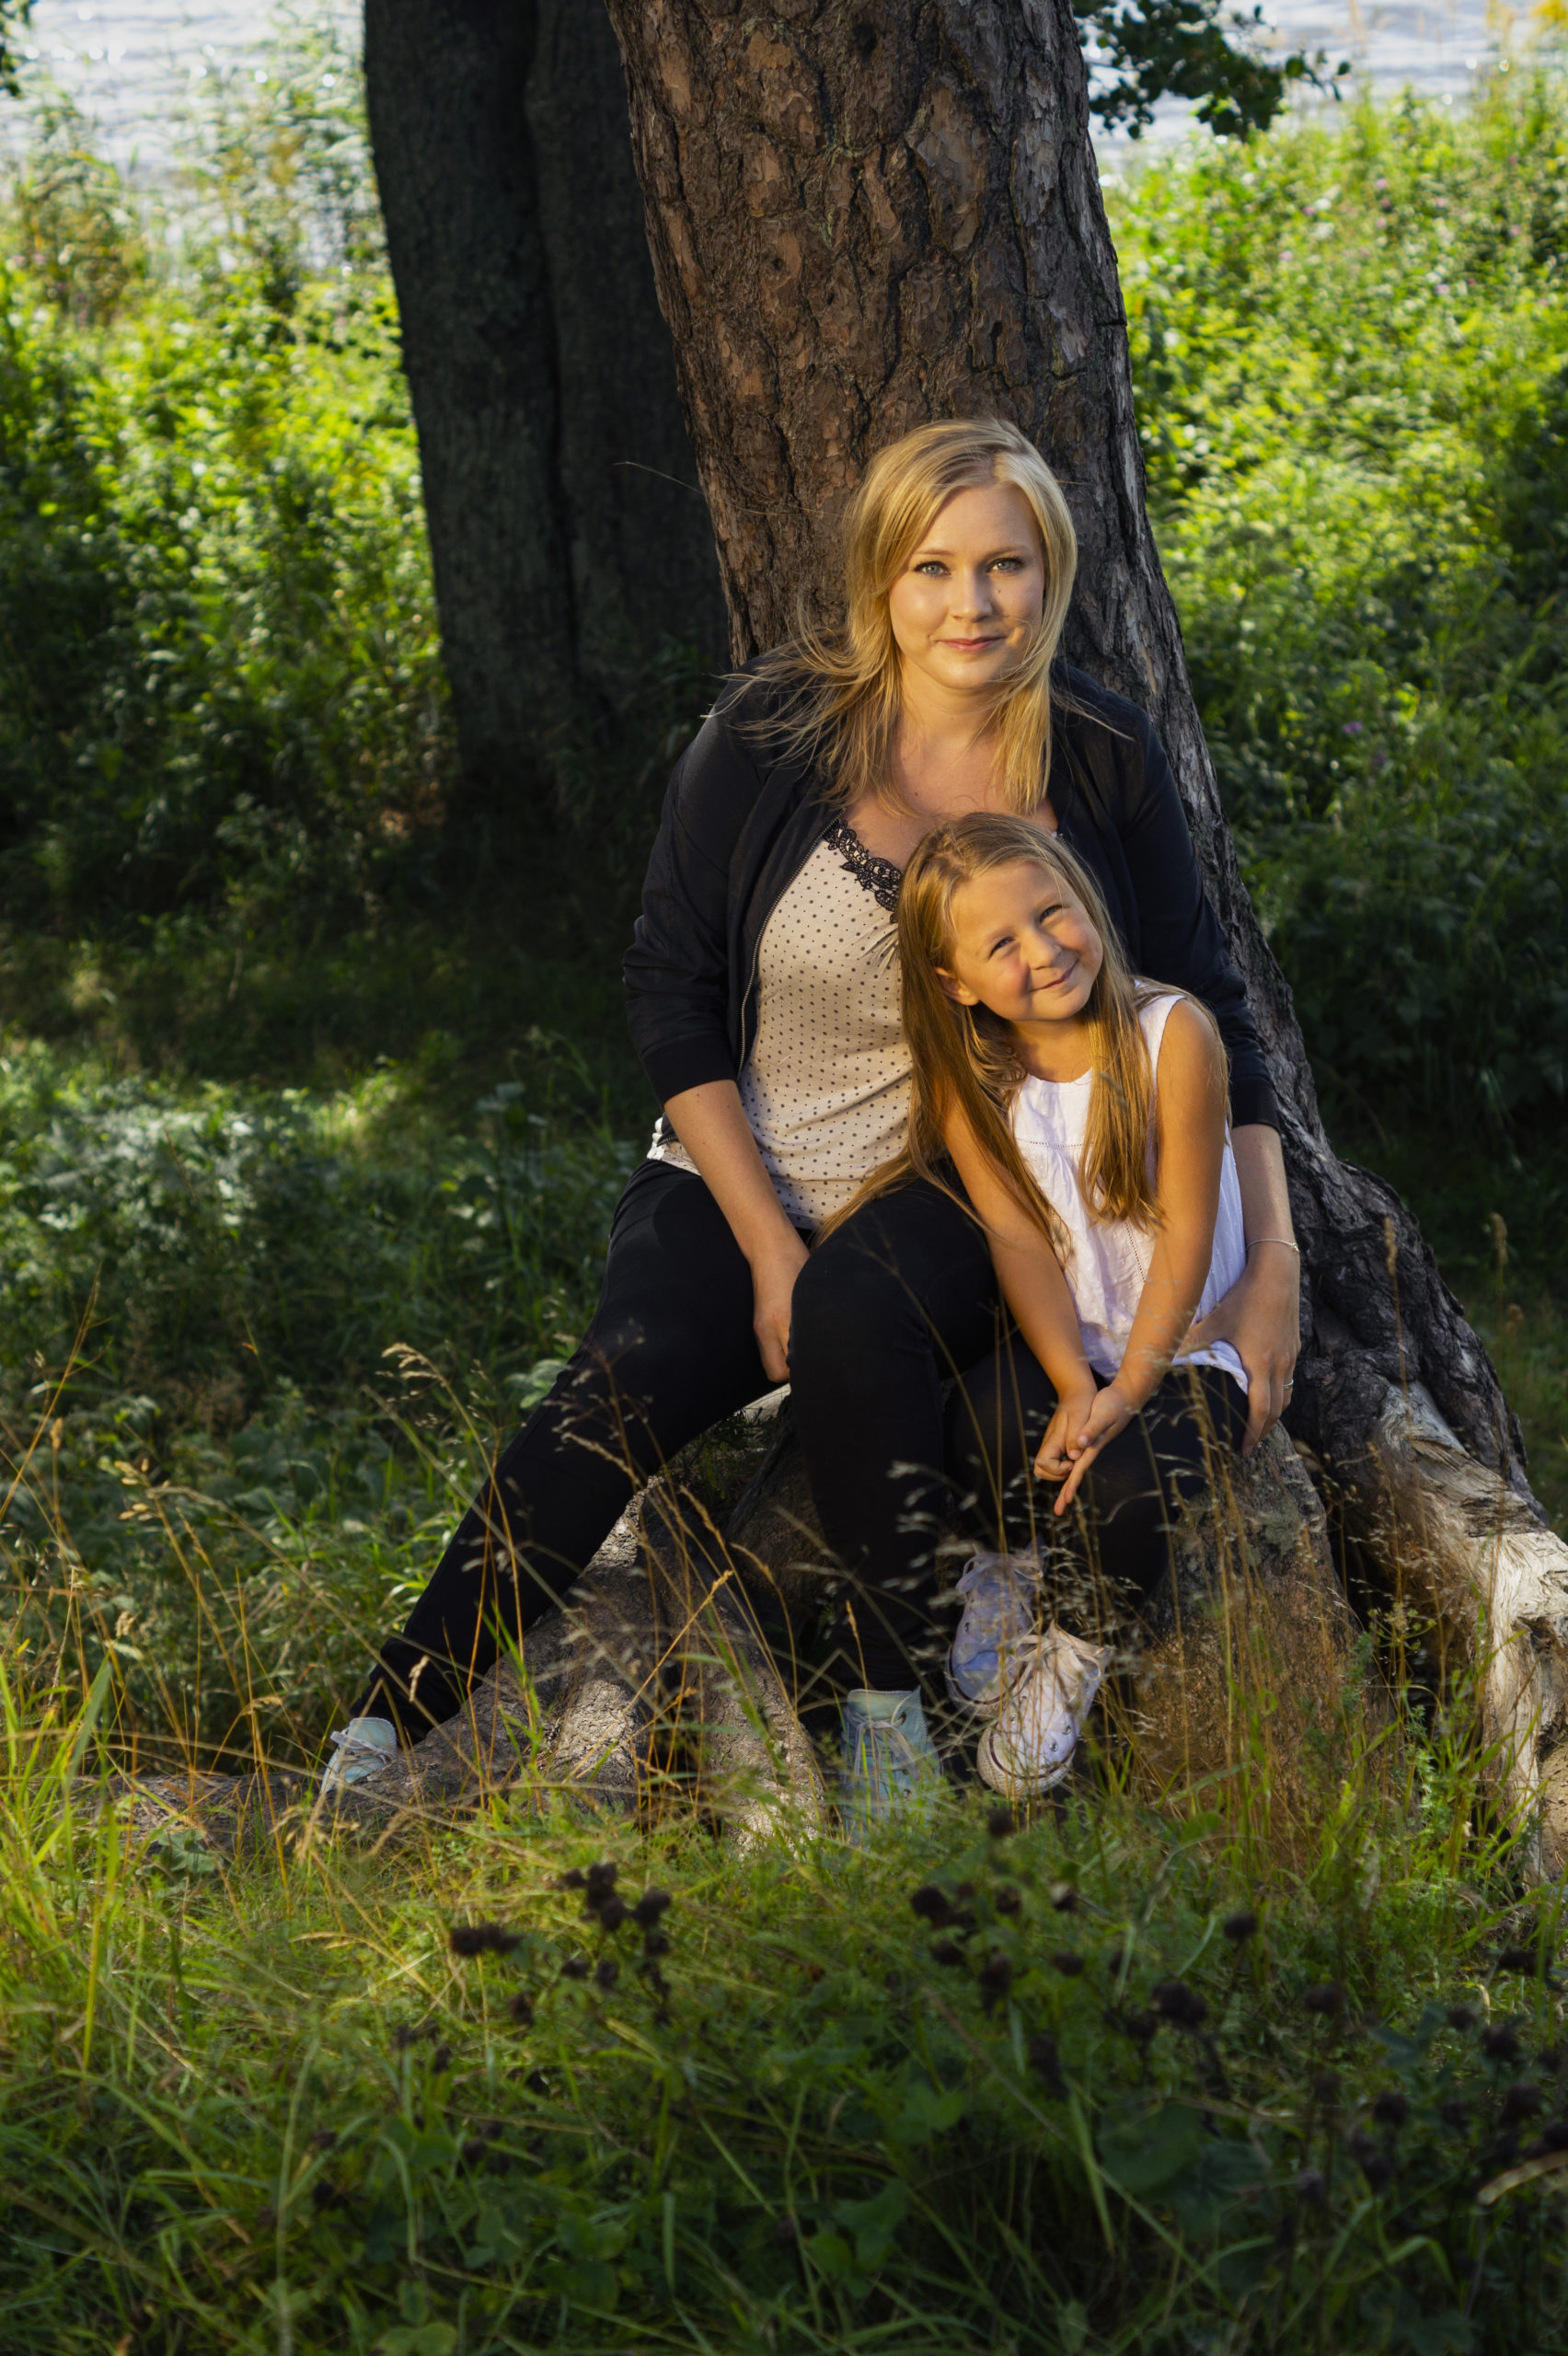 Jonna Tarakkamäki - Fotograf i Karlskoga